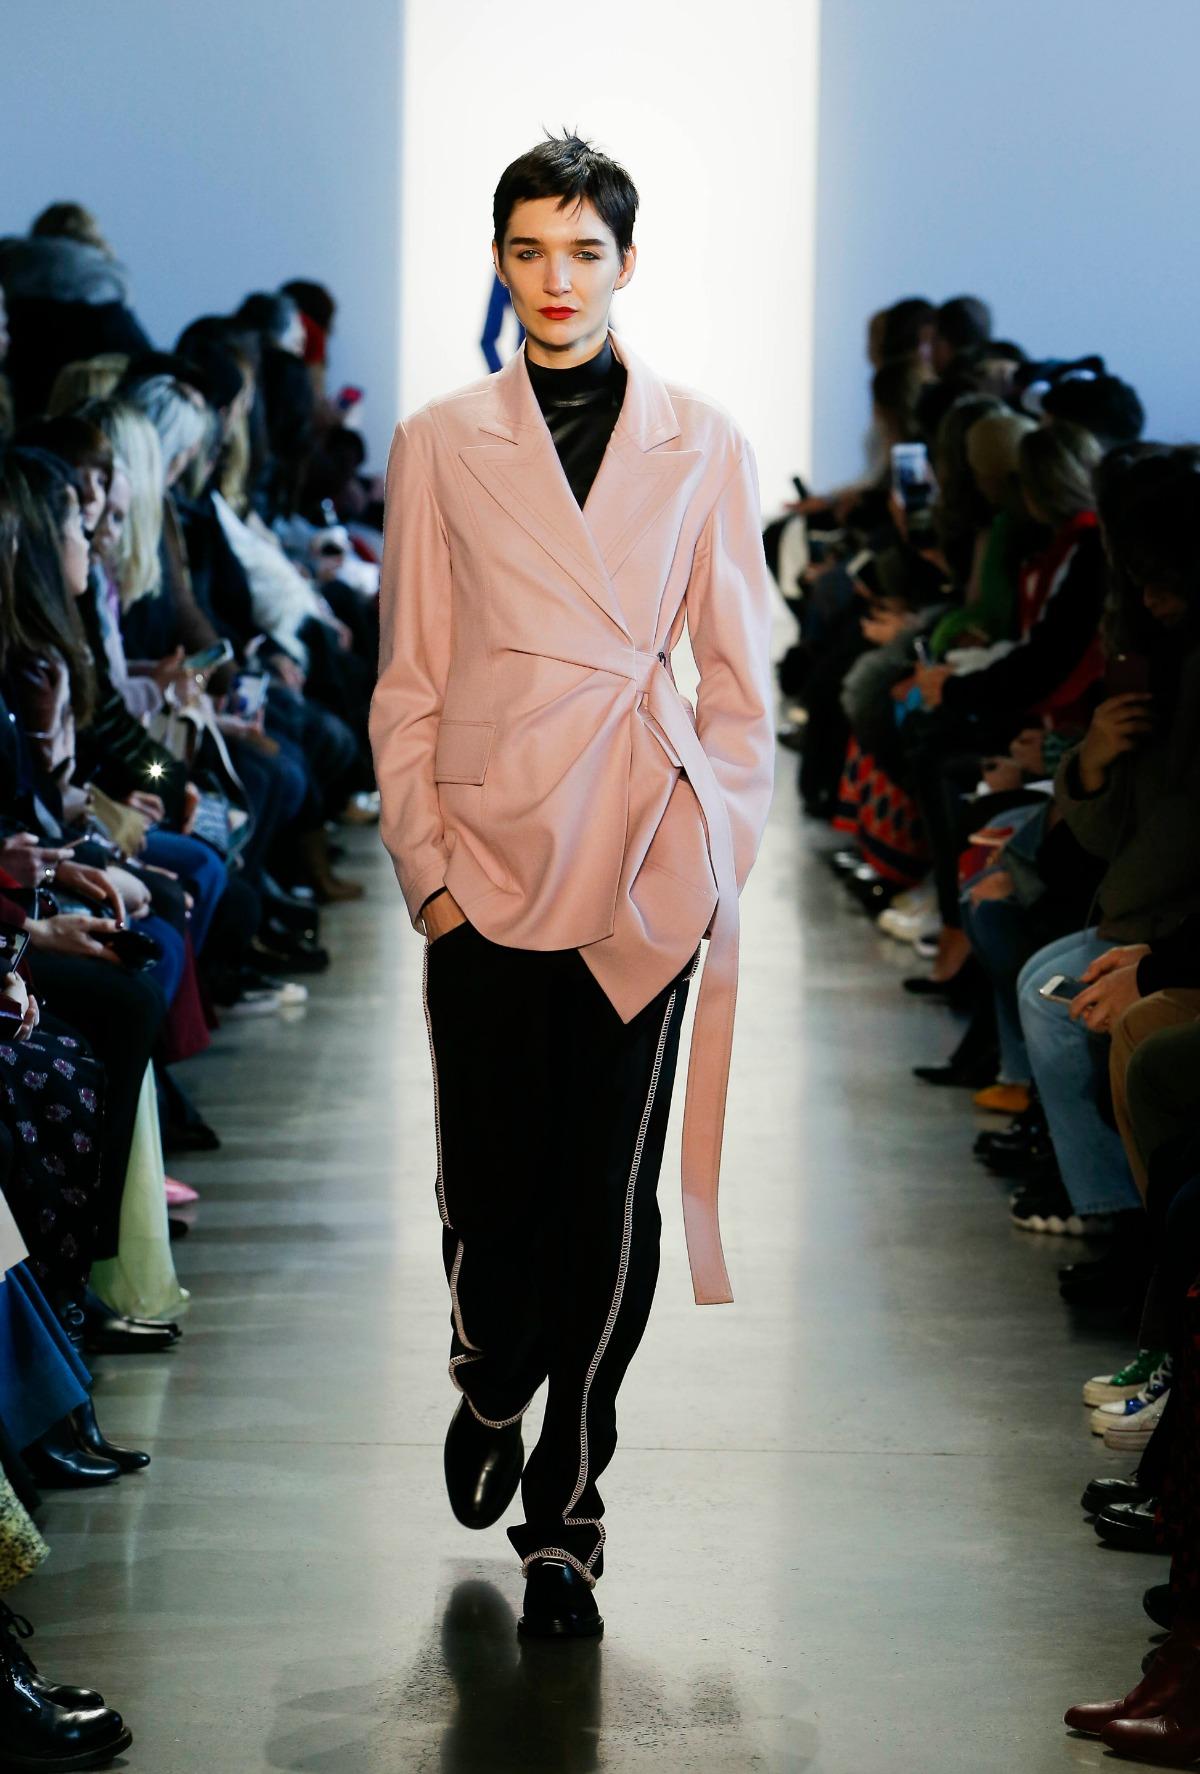 COLOVOS Fall 2018 Runway at NYFW I Millennial Pink Jacket #NYFW #WinterFashion